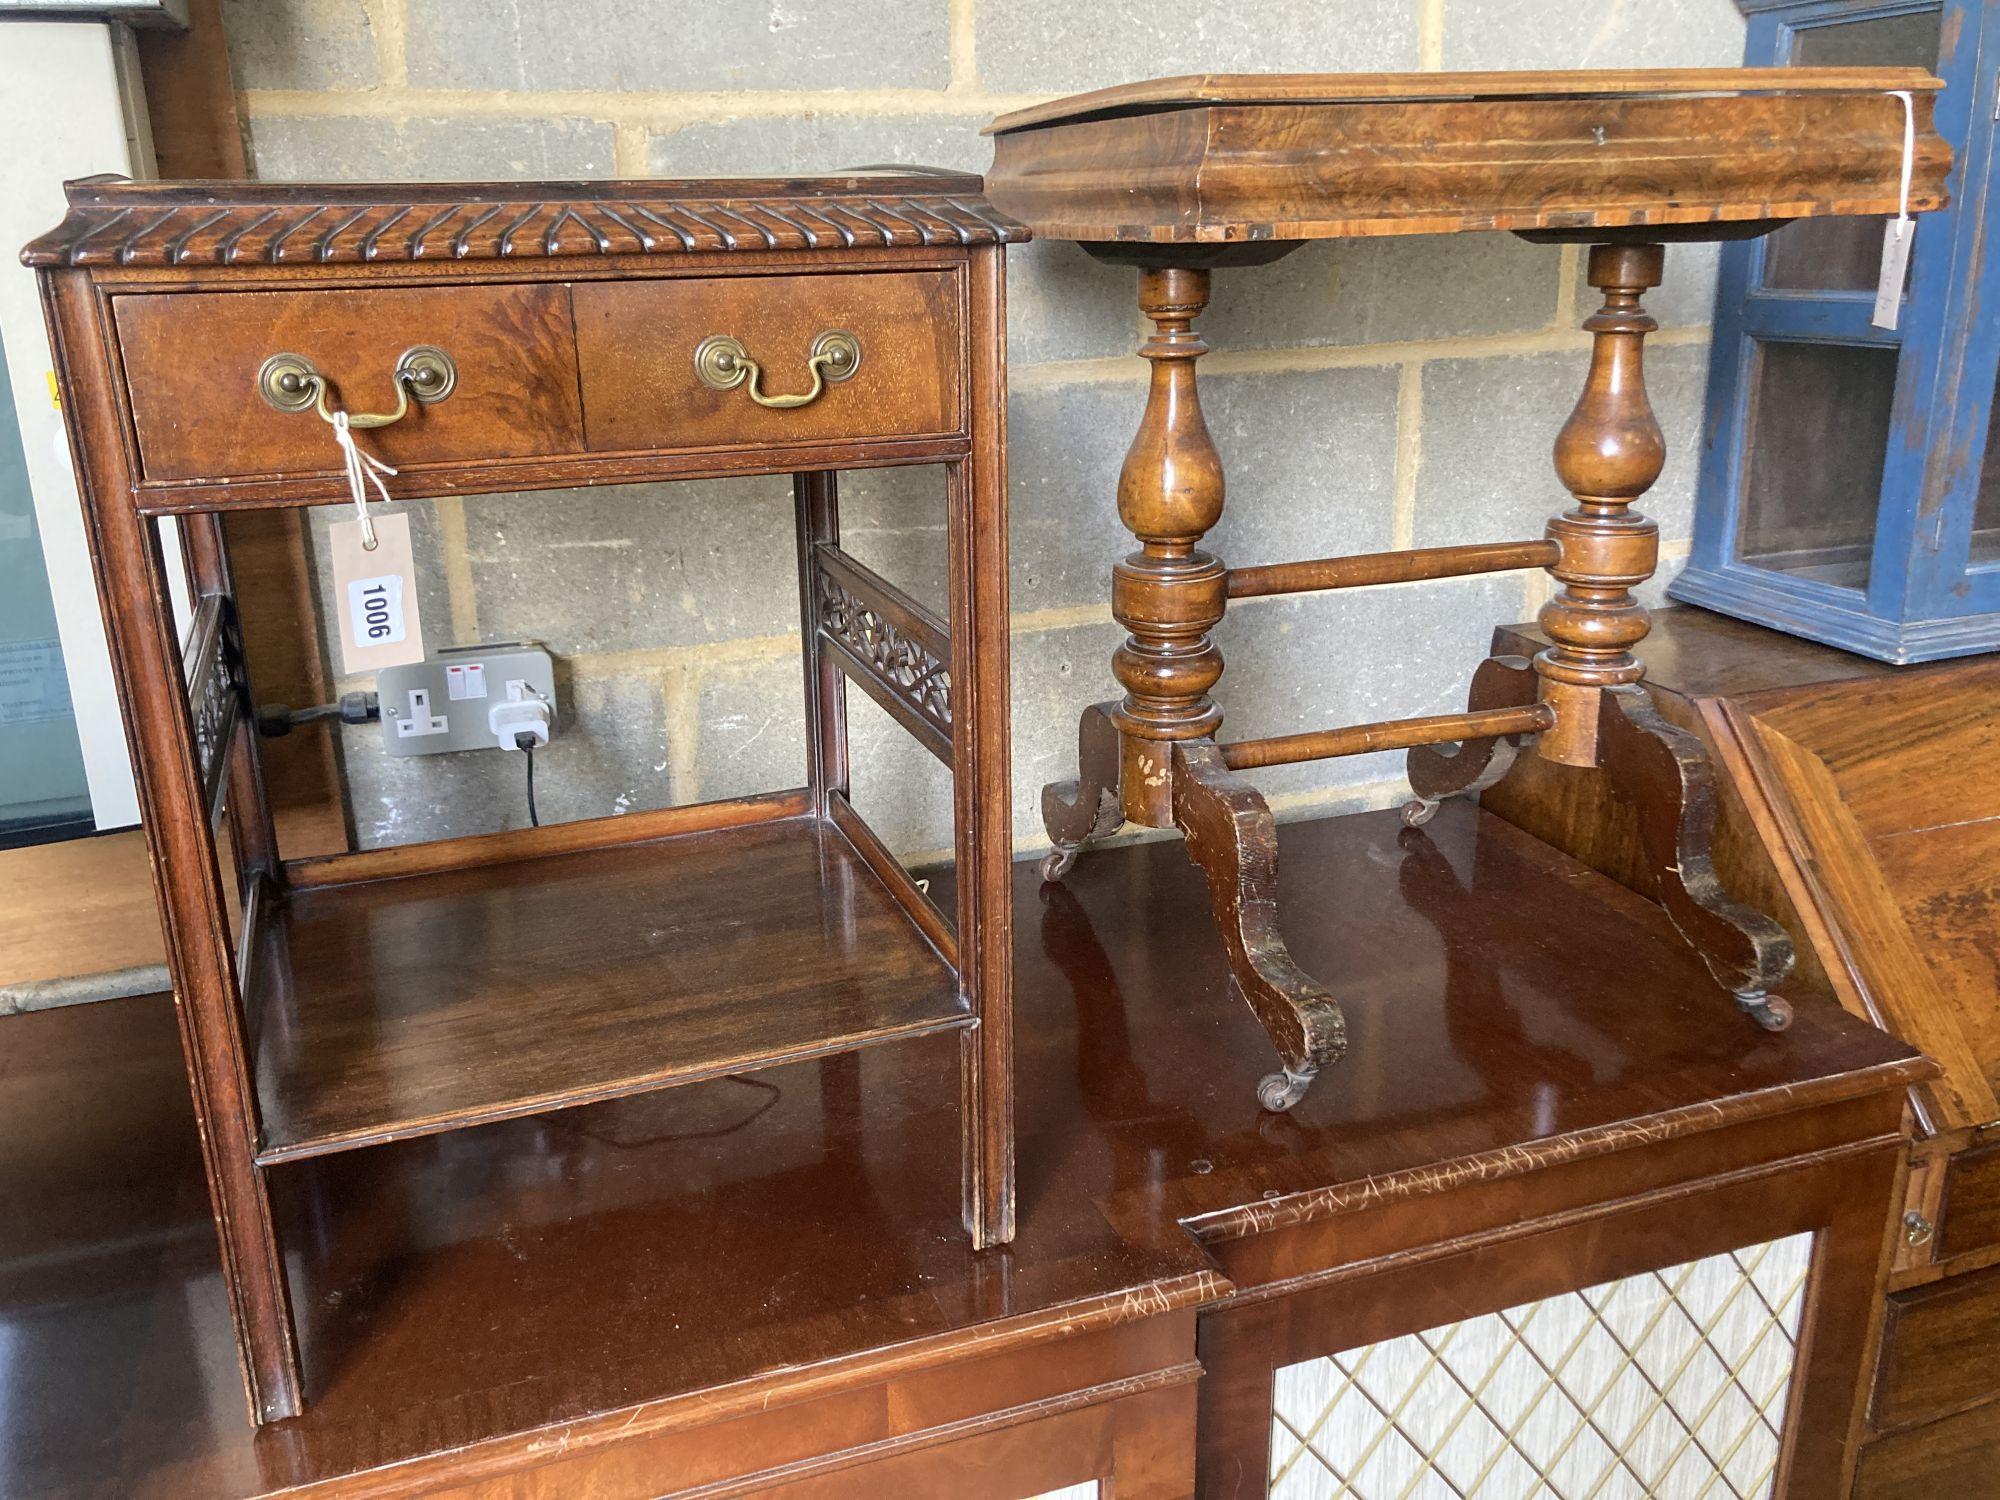 A Victorian burr walnut work table, width 56cm, depth 41cm, height 69cm, together with a Georgian